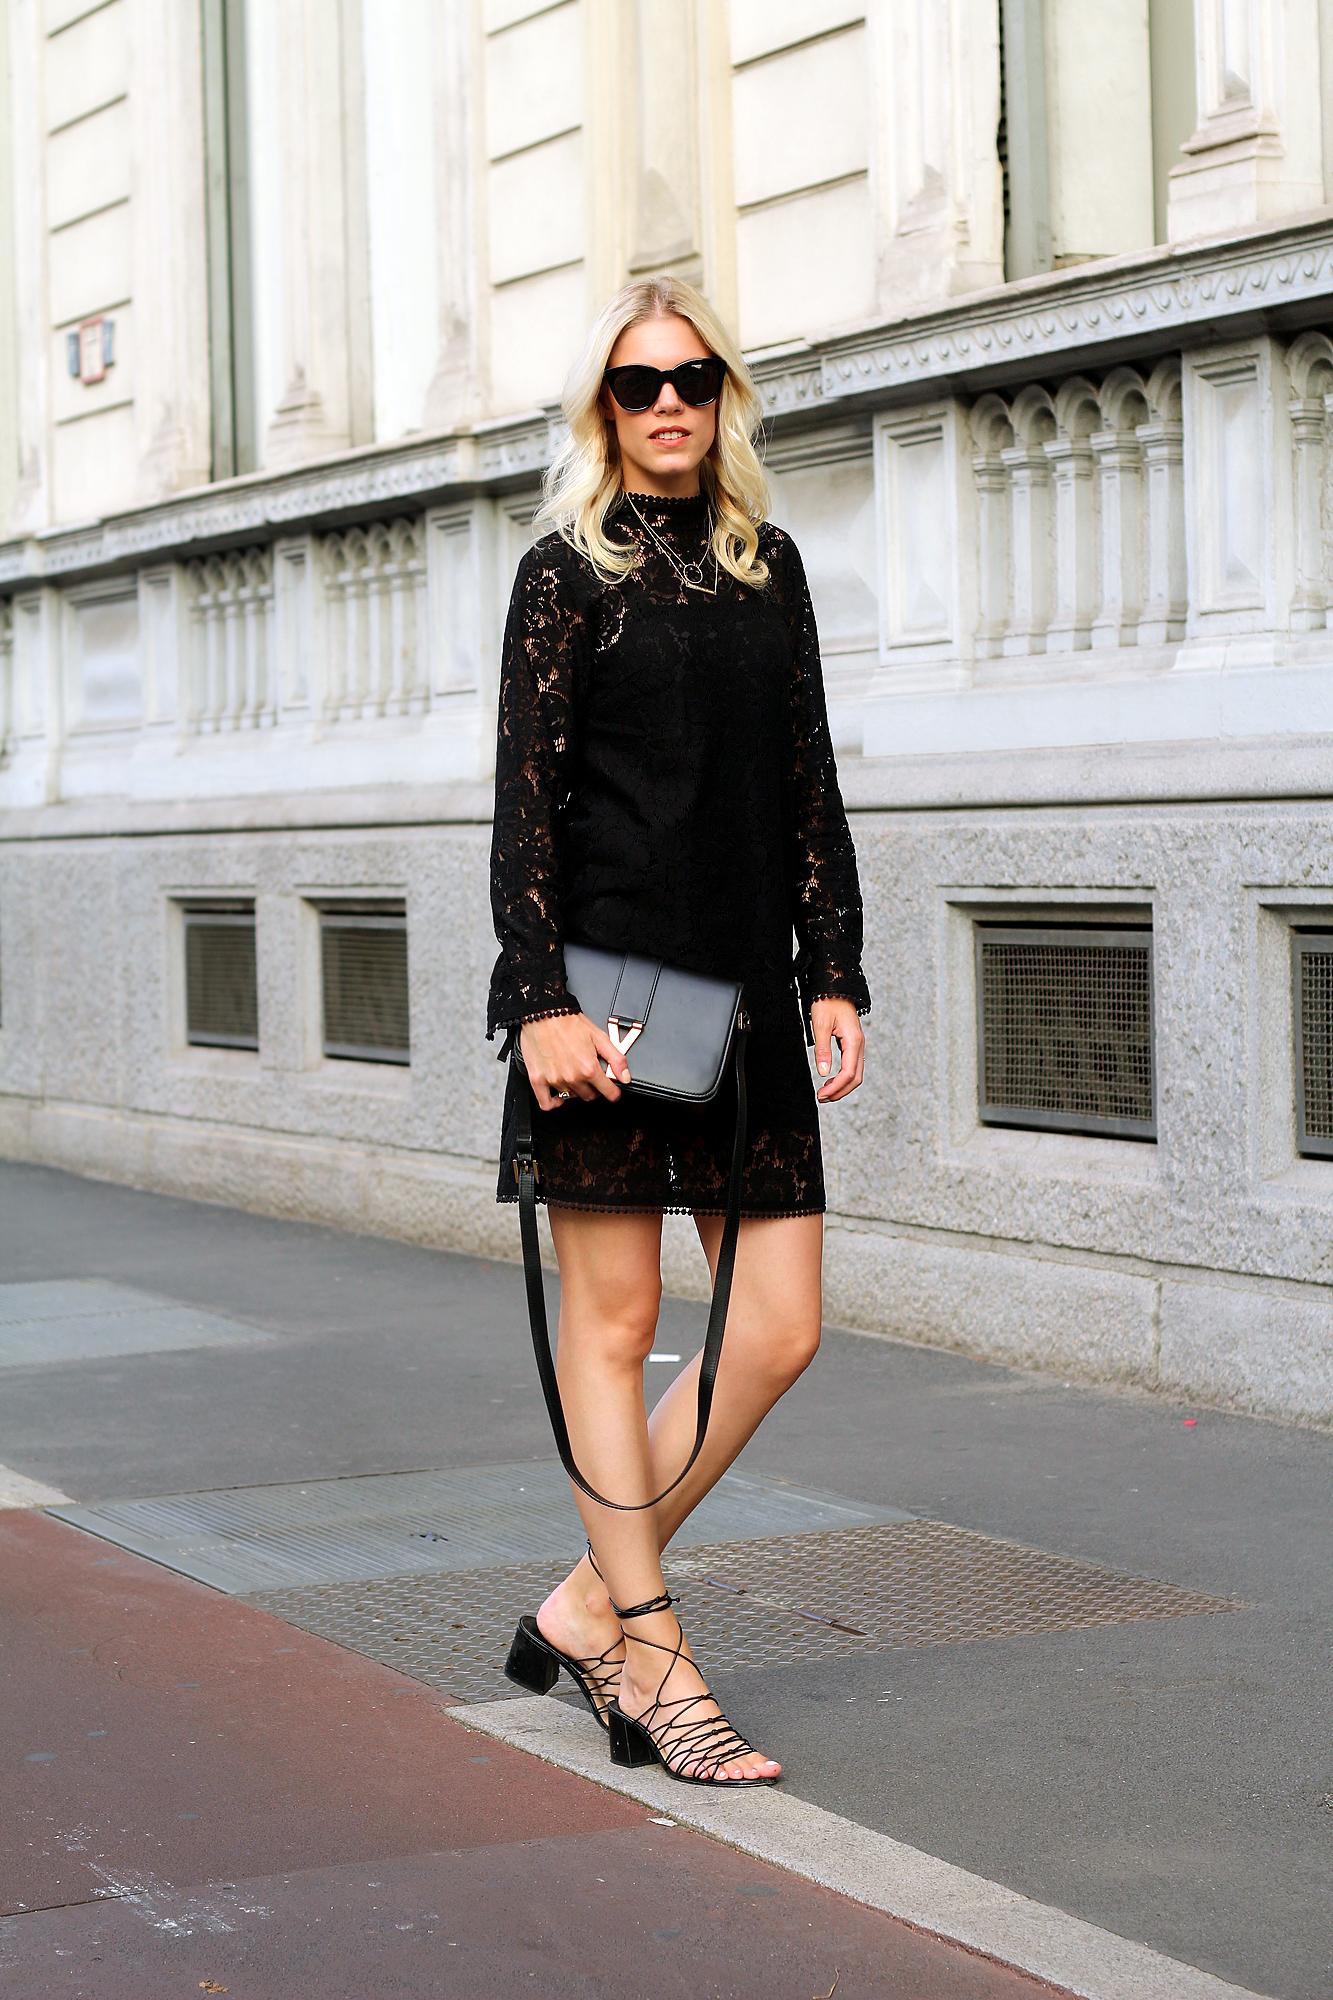 hm_lace_dress_schwarz_kleid_somehappyshoes